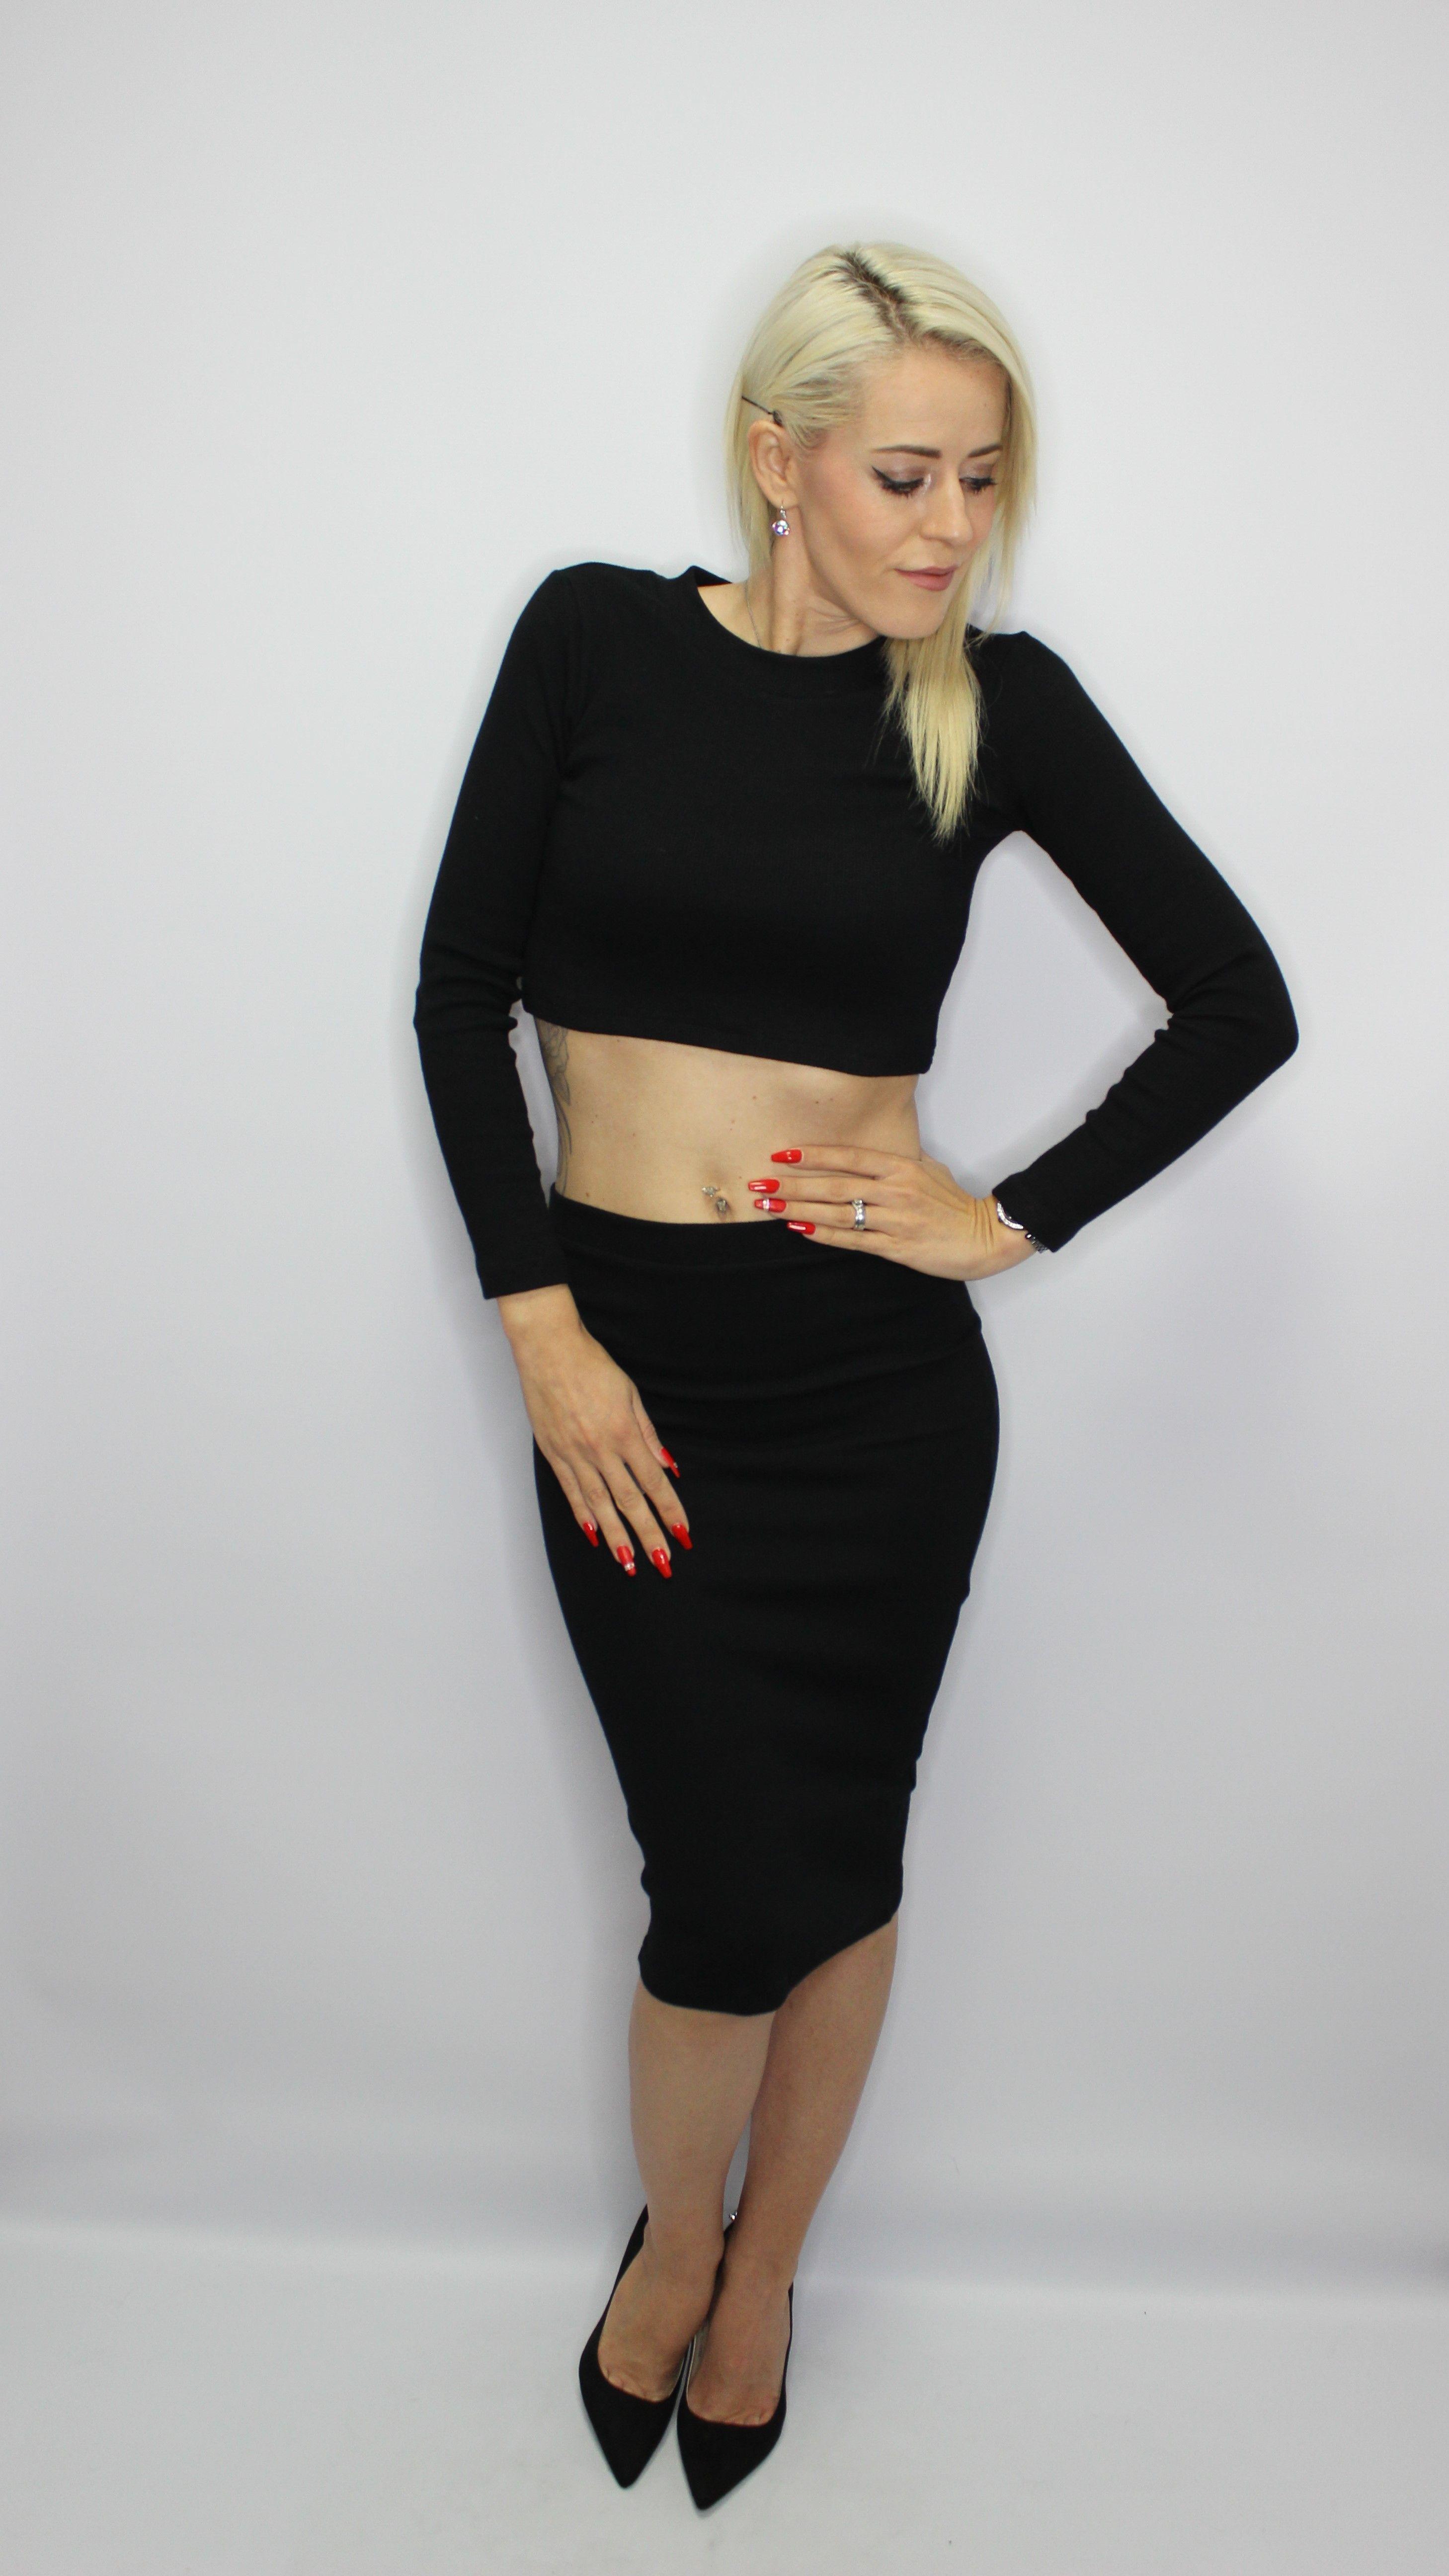 Black 2 Piece Skirt/Top Set